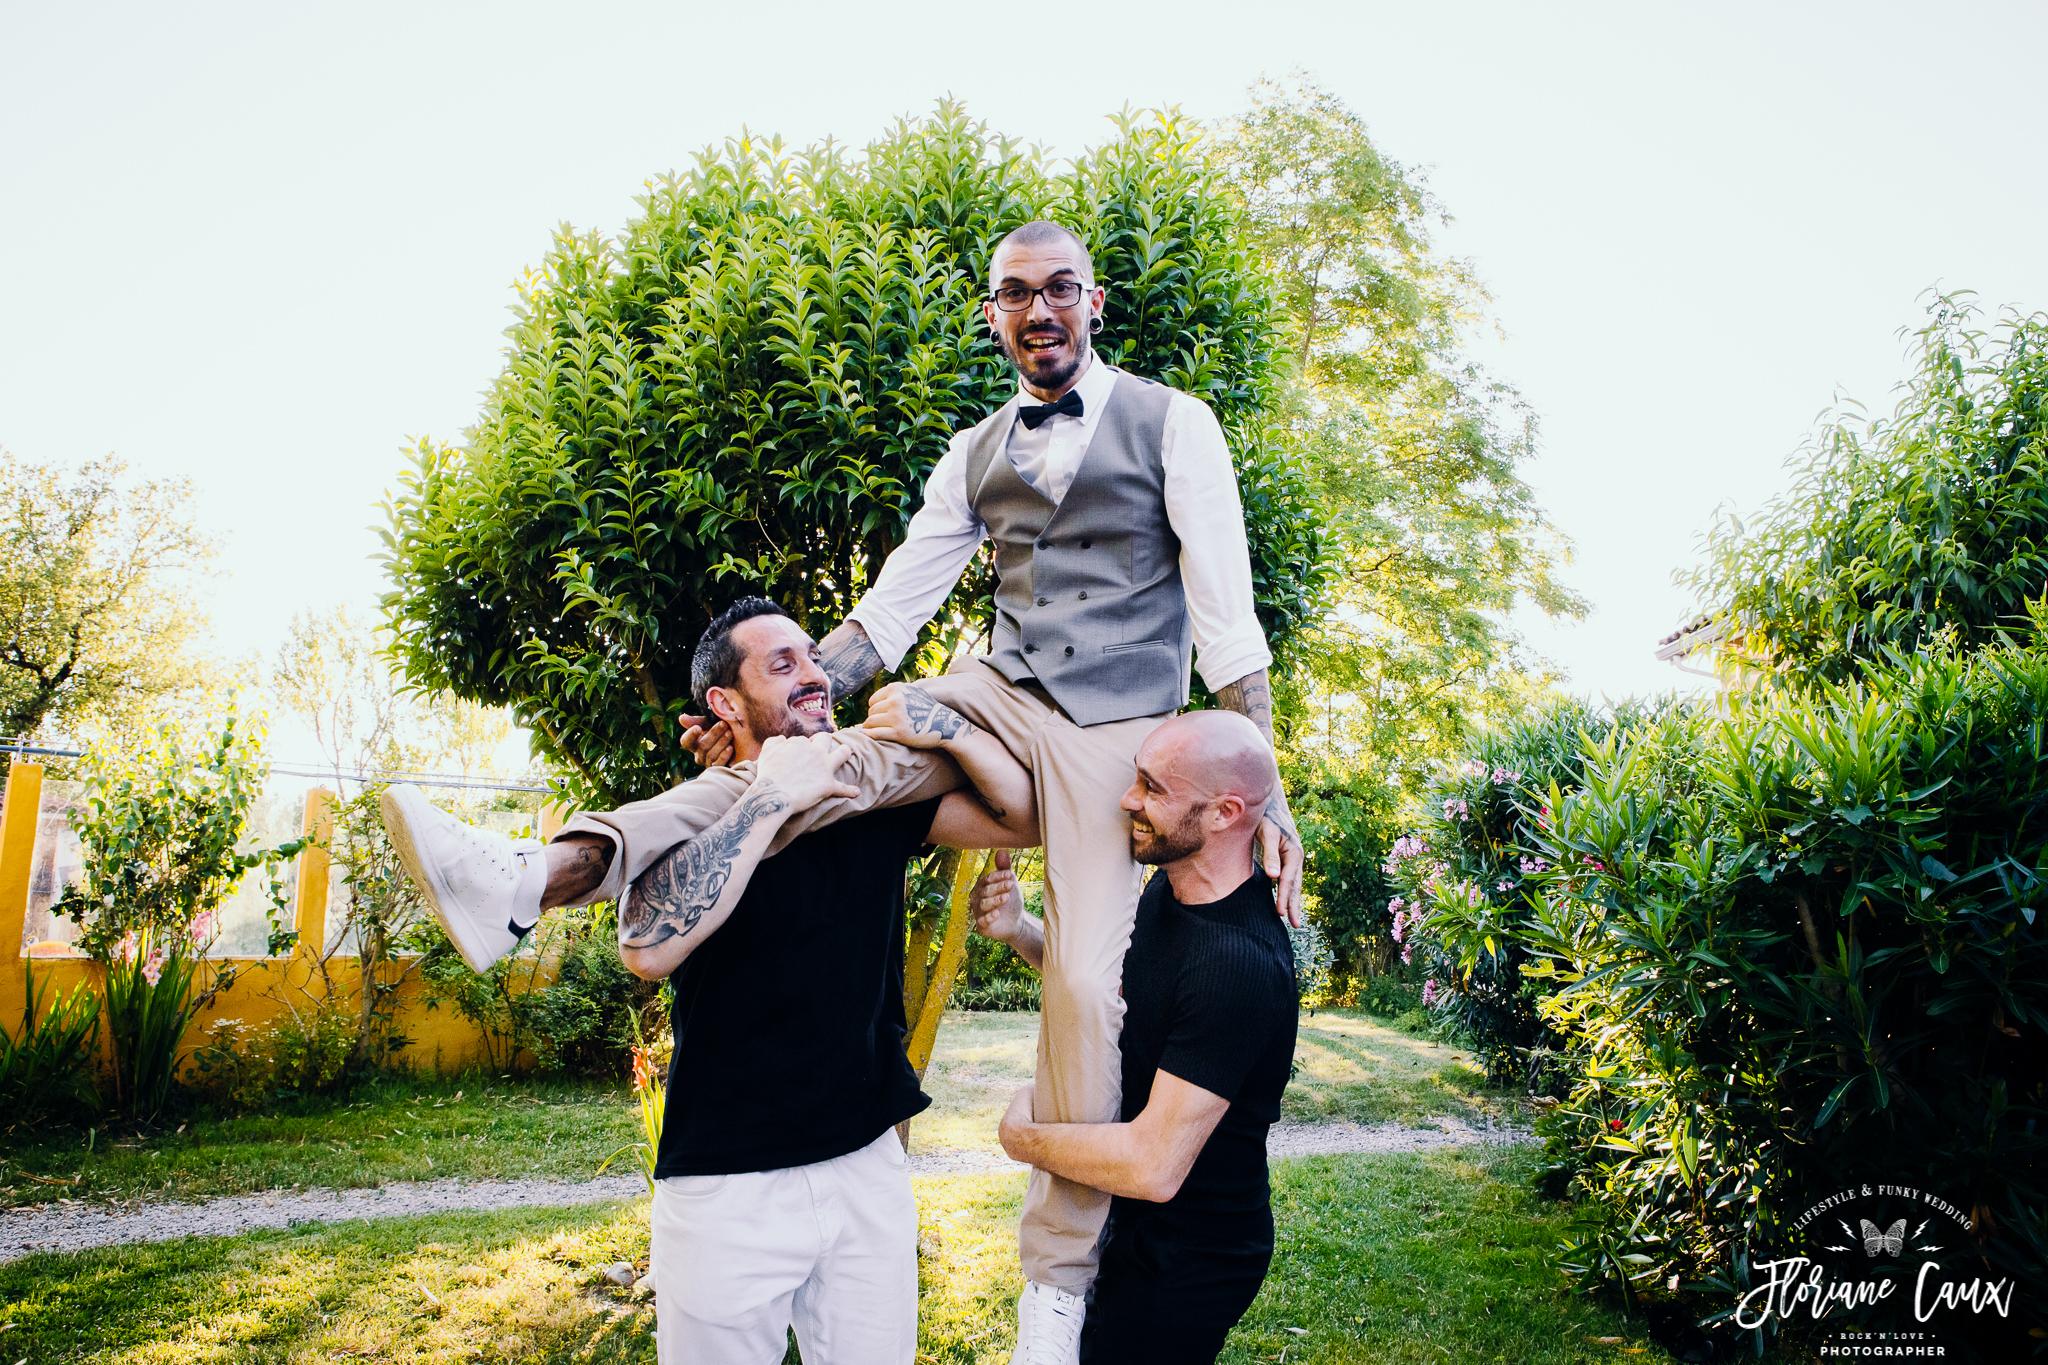 photographe-mariage-toulouse-rocknroll-maries-tatoues-floriane-caux-111